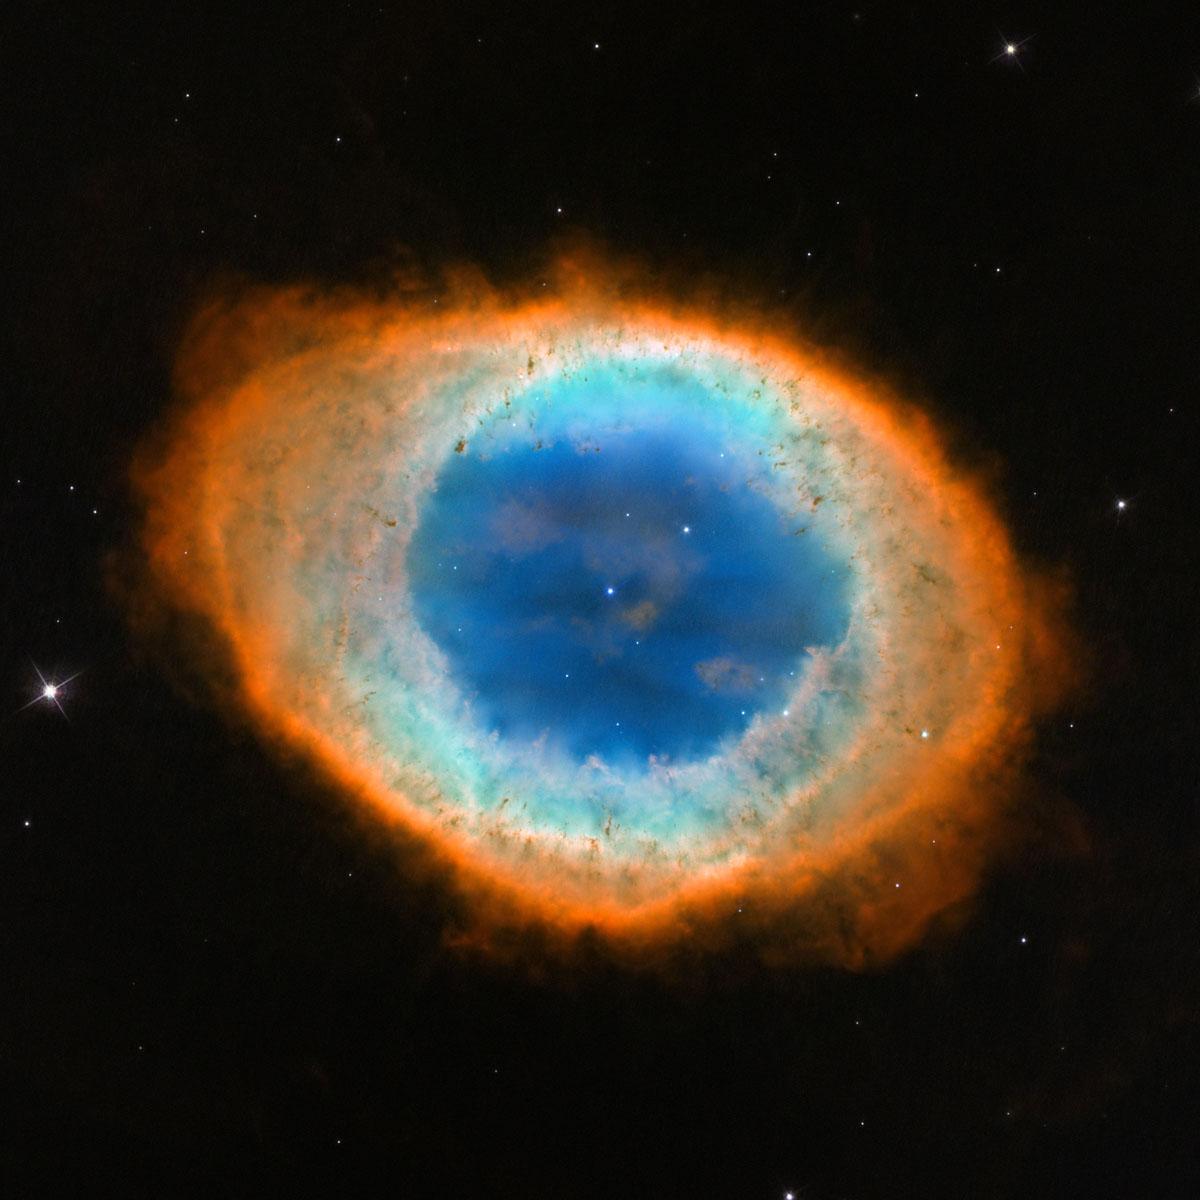 nasa.gov hubble telescope - photo #40